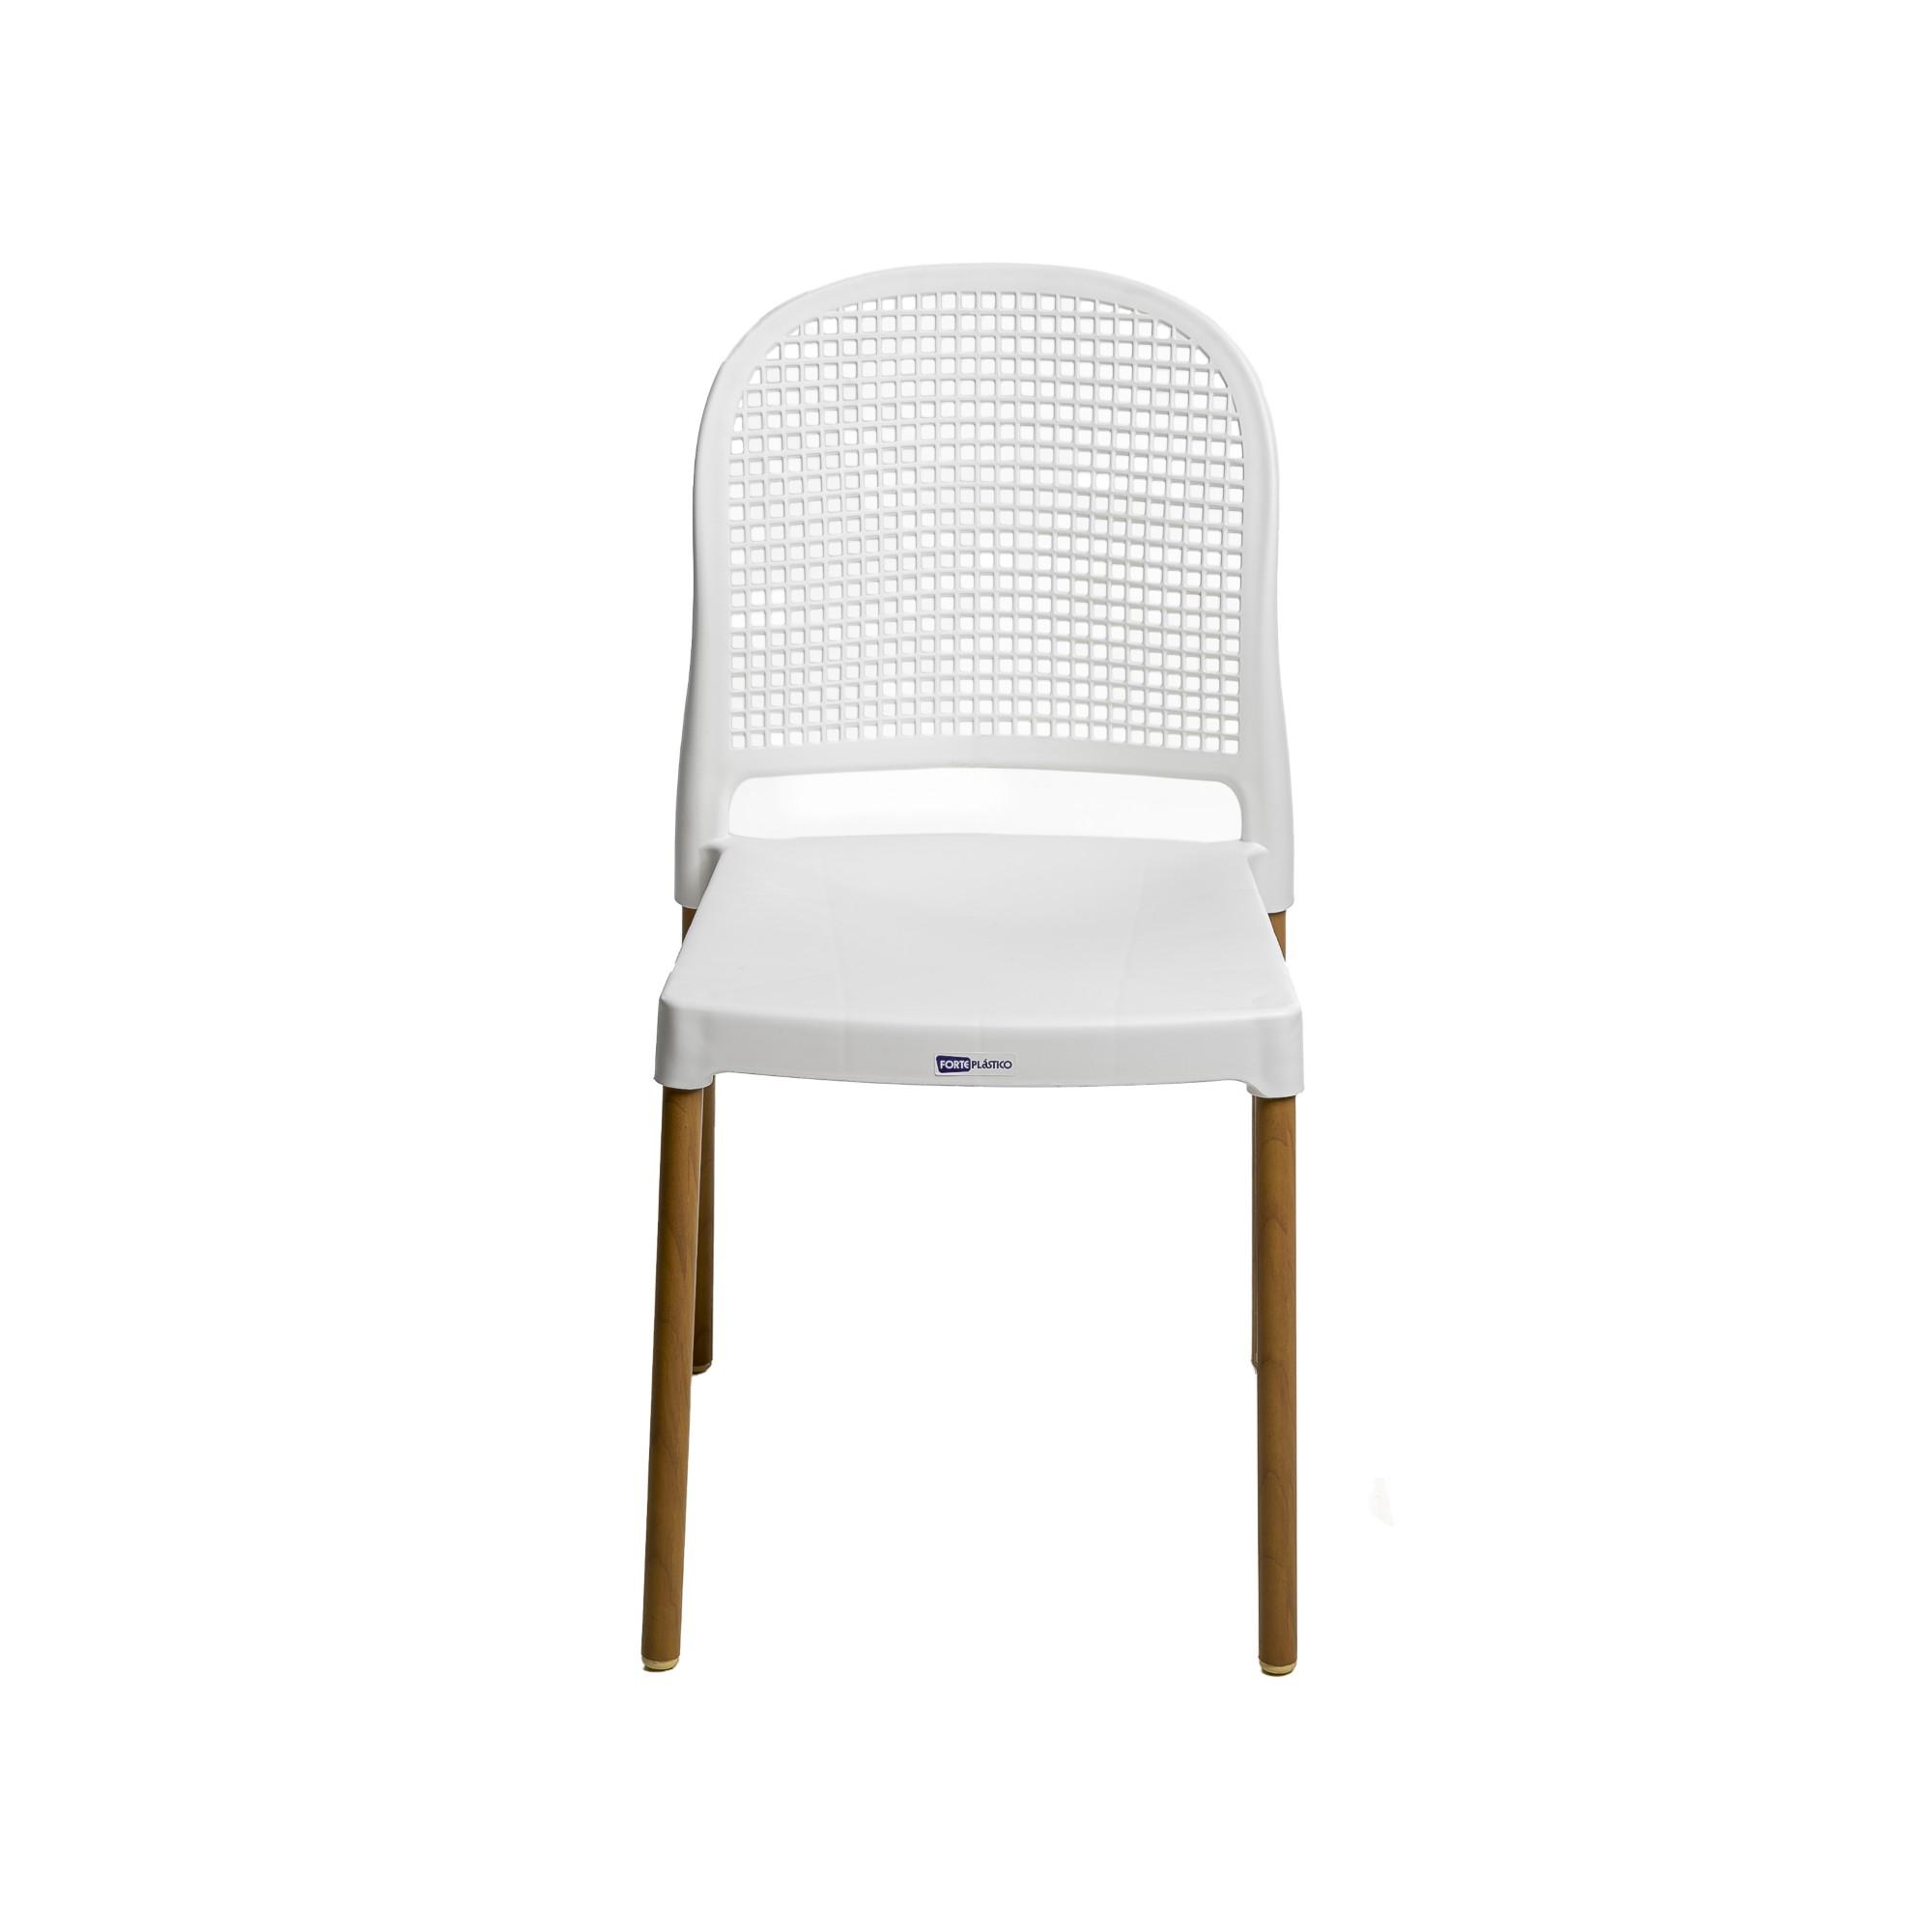 Cadeira Vintage Aluminio e Plastico Branca - Forte Plastico